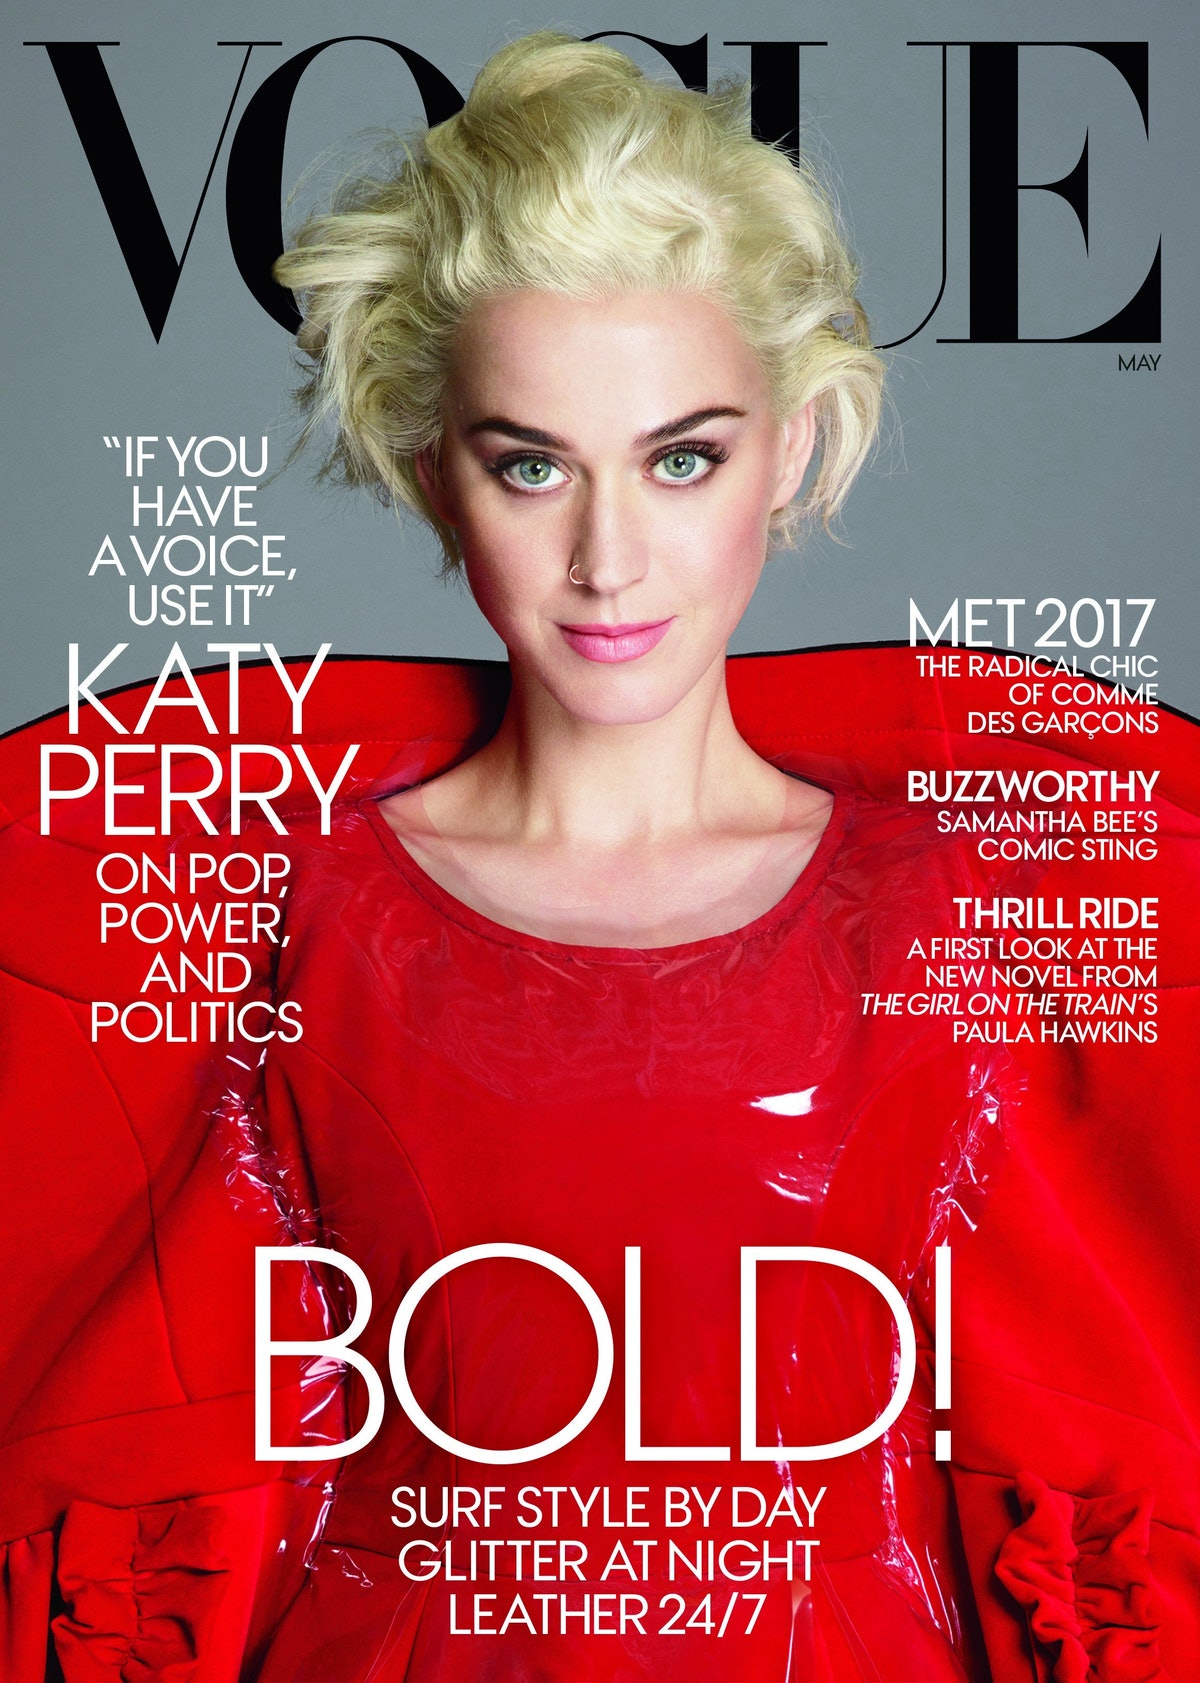 Katy-Perry-Vogue.jpg